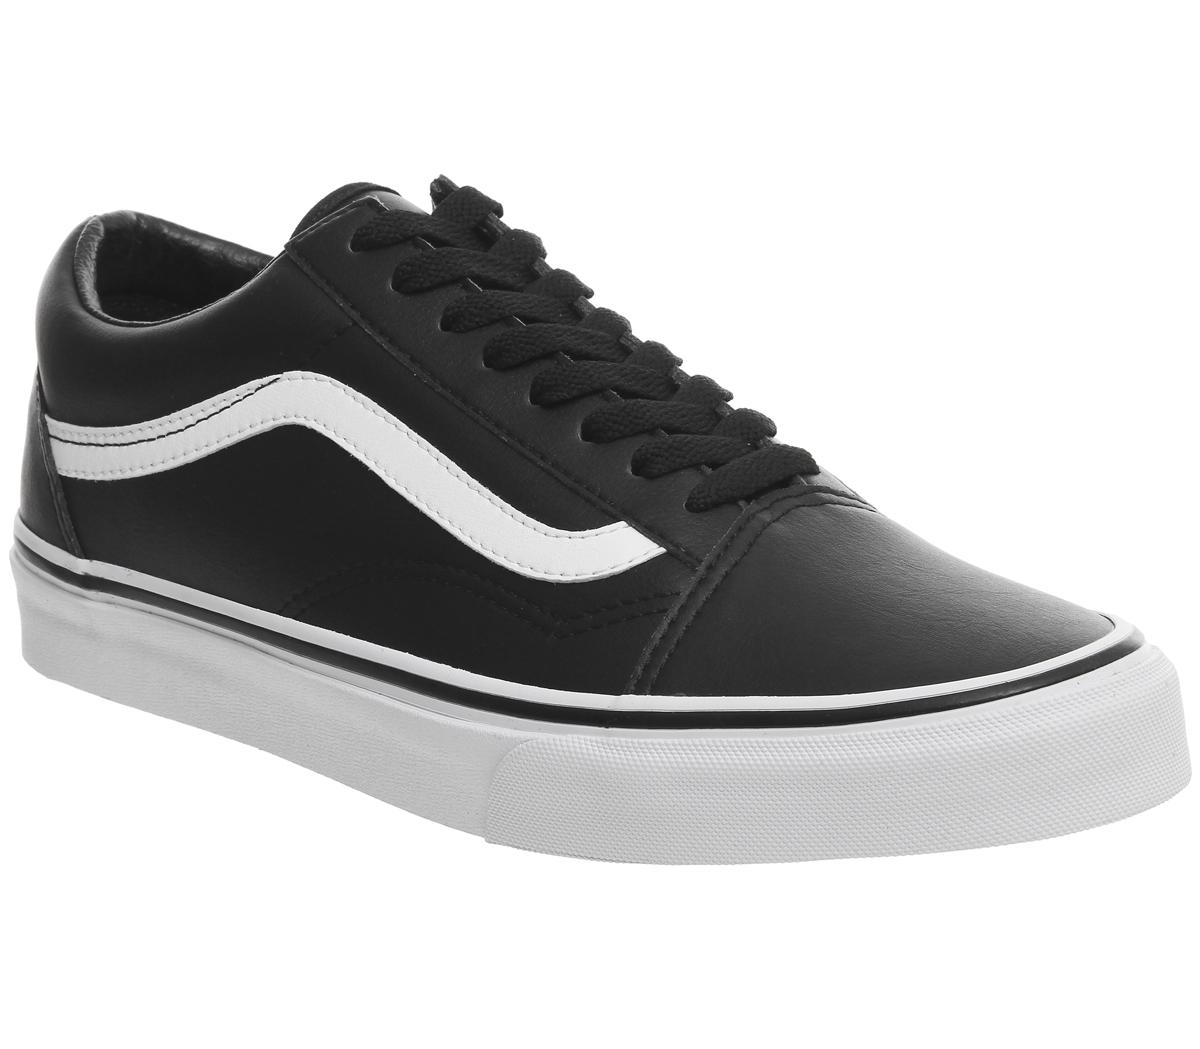 Vans Old Skool Tumble Black White